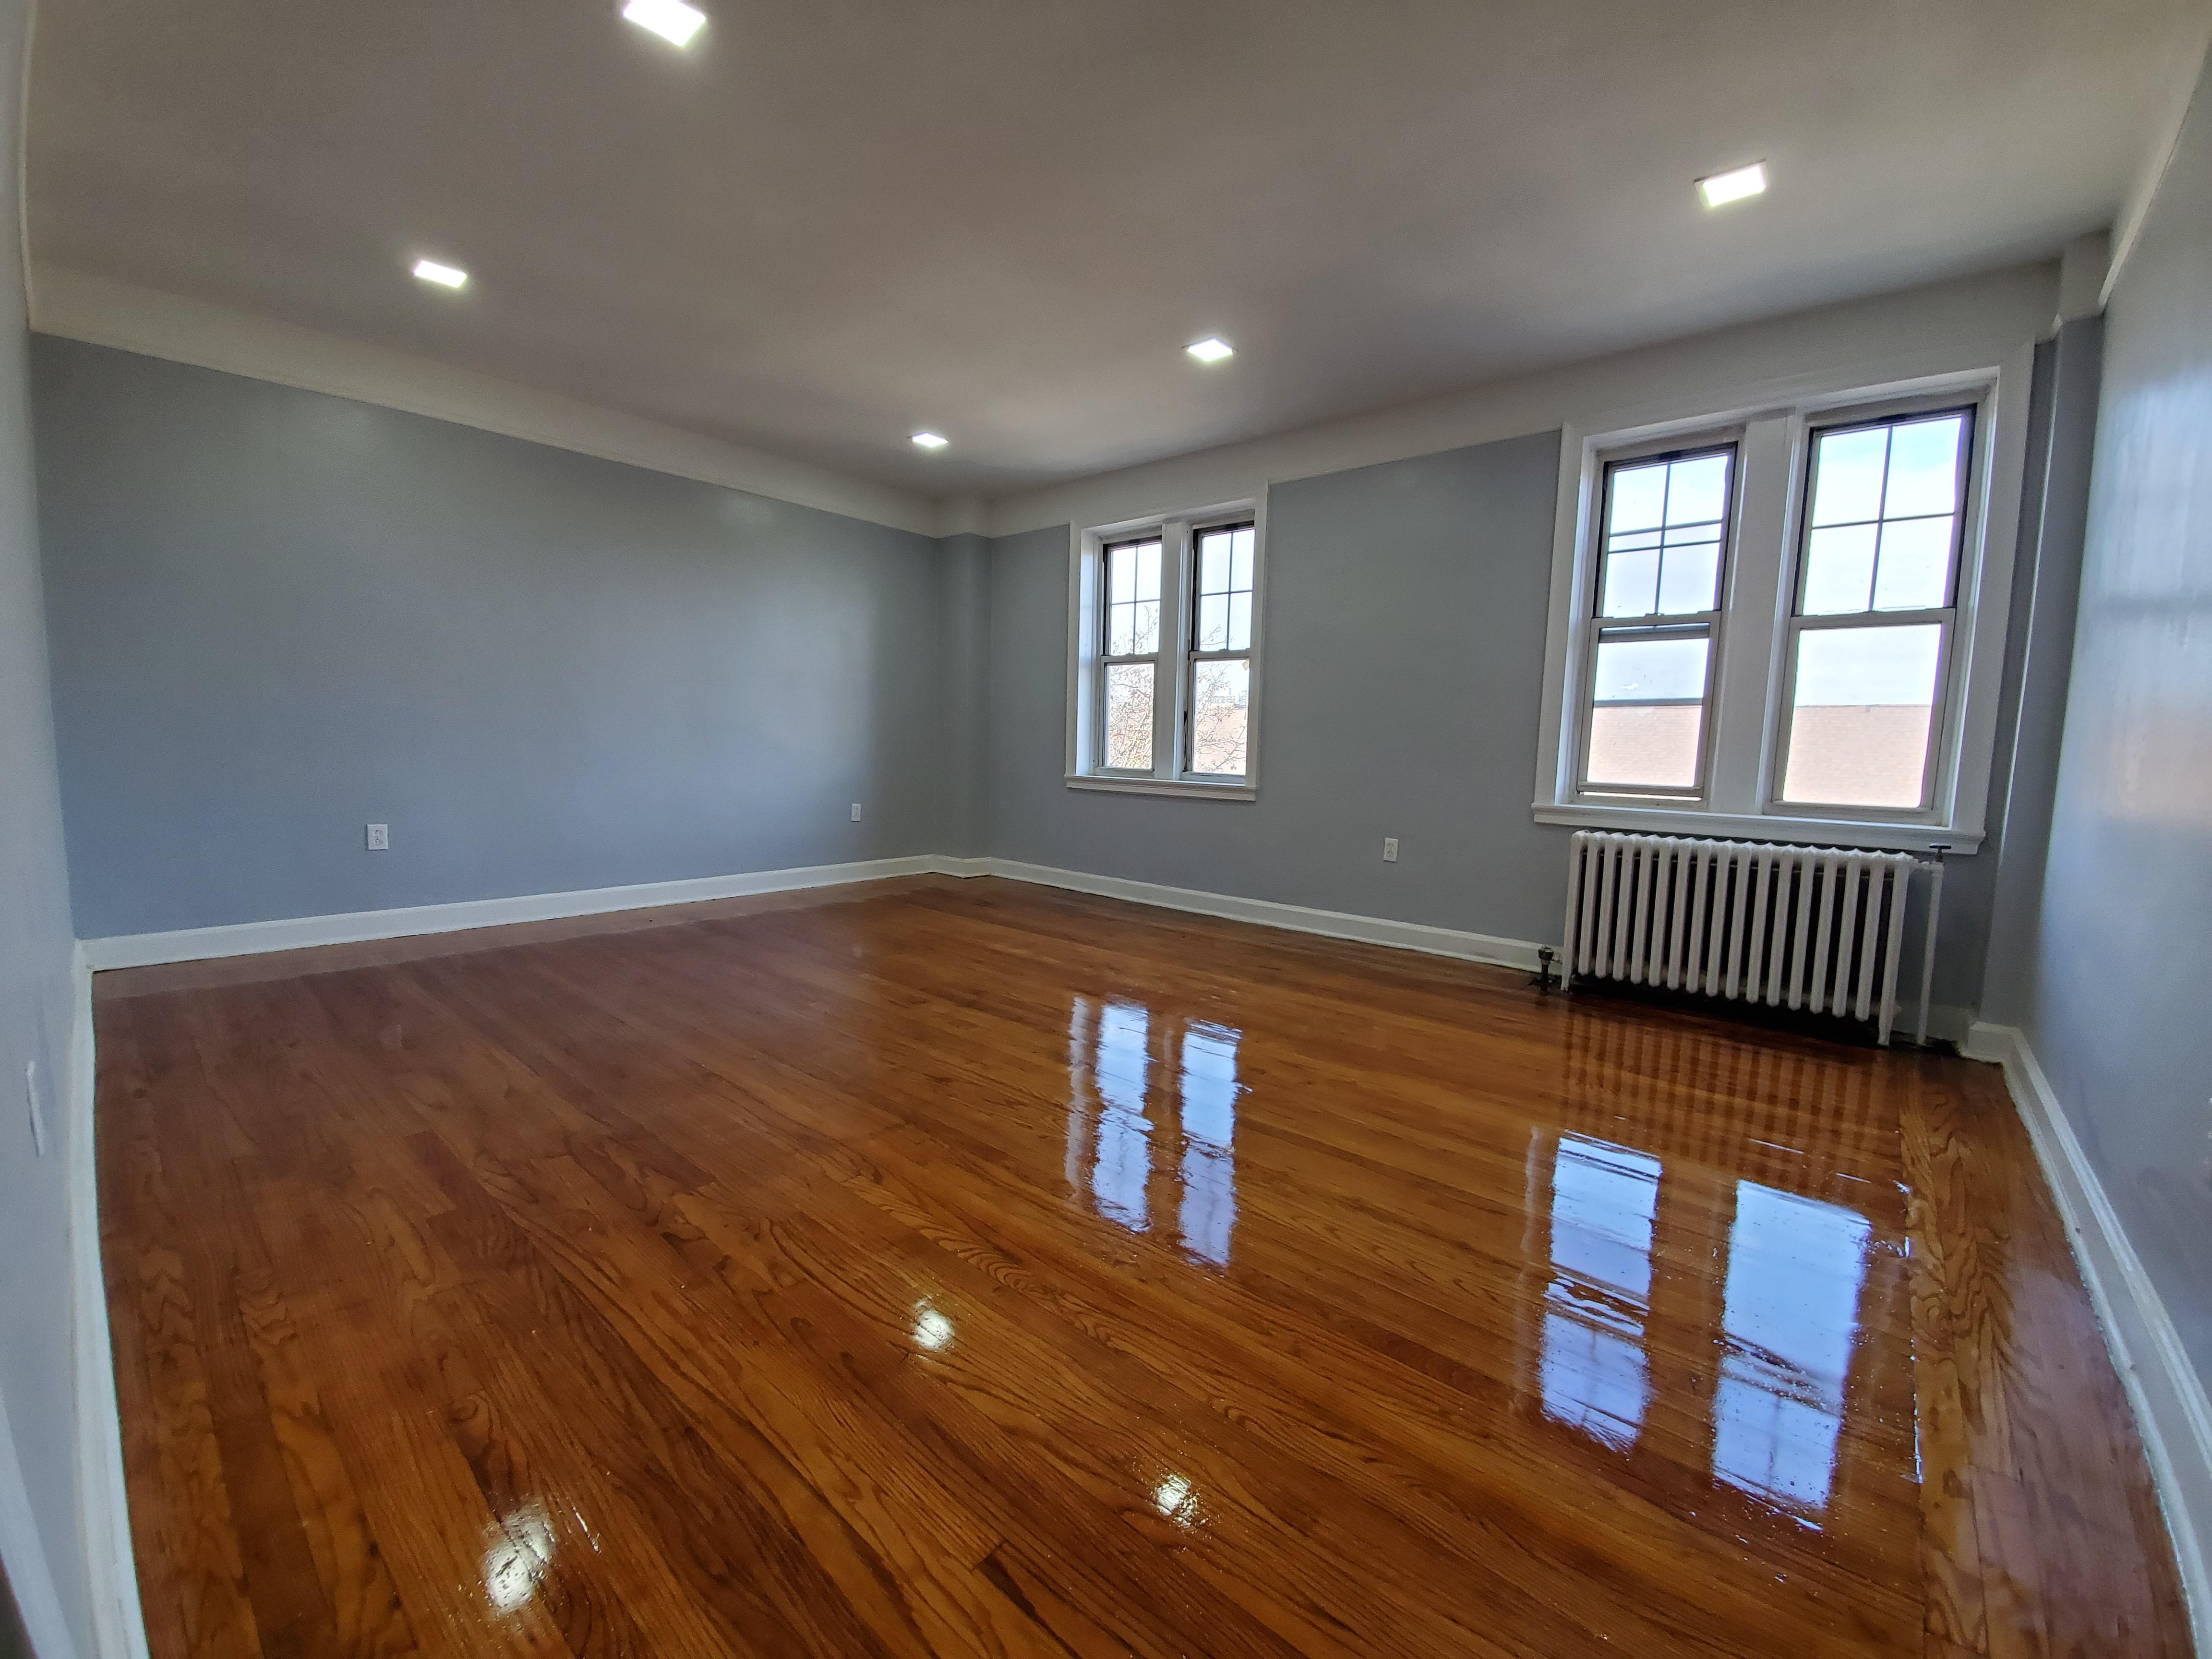 50 Anderson Street, Hackensack, NJ 07601 for rent